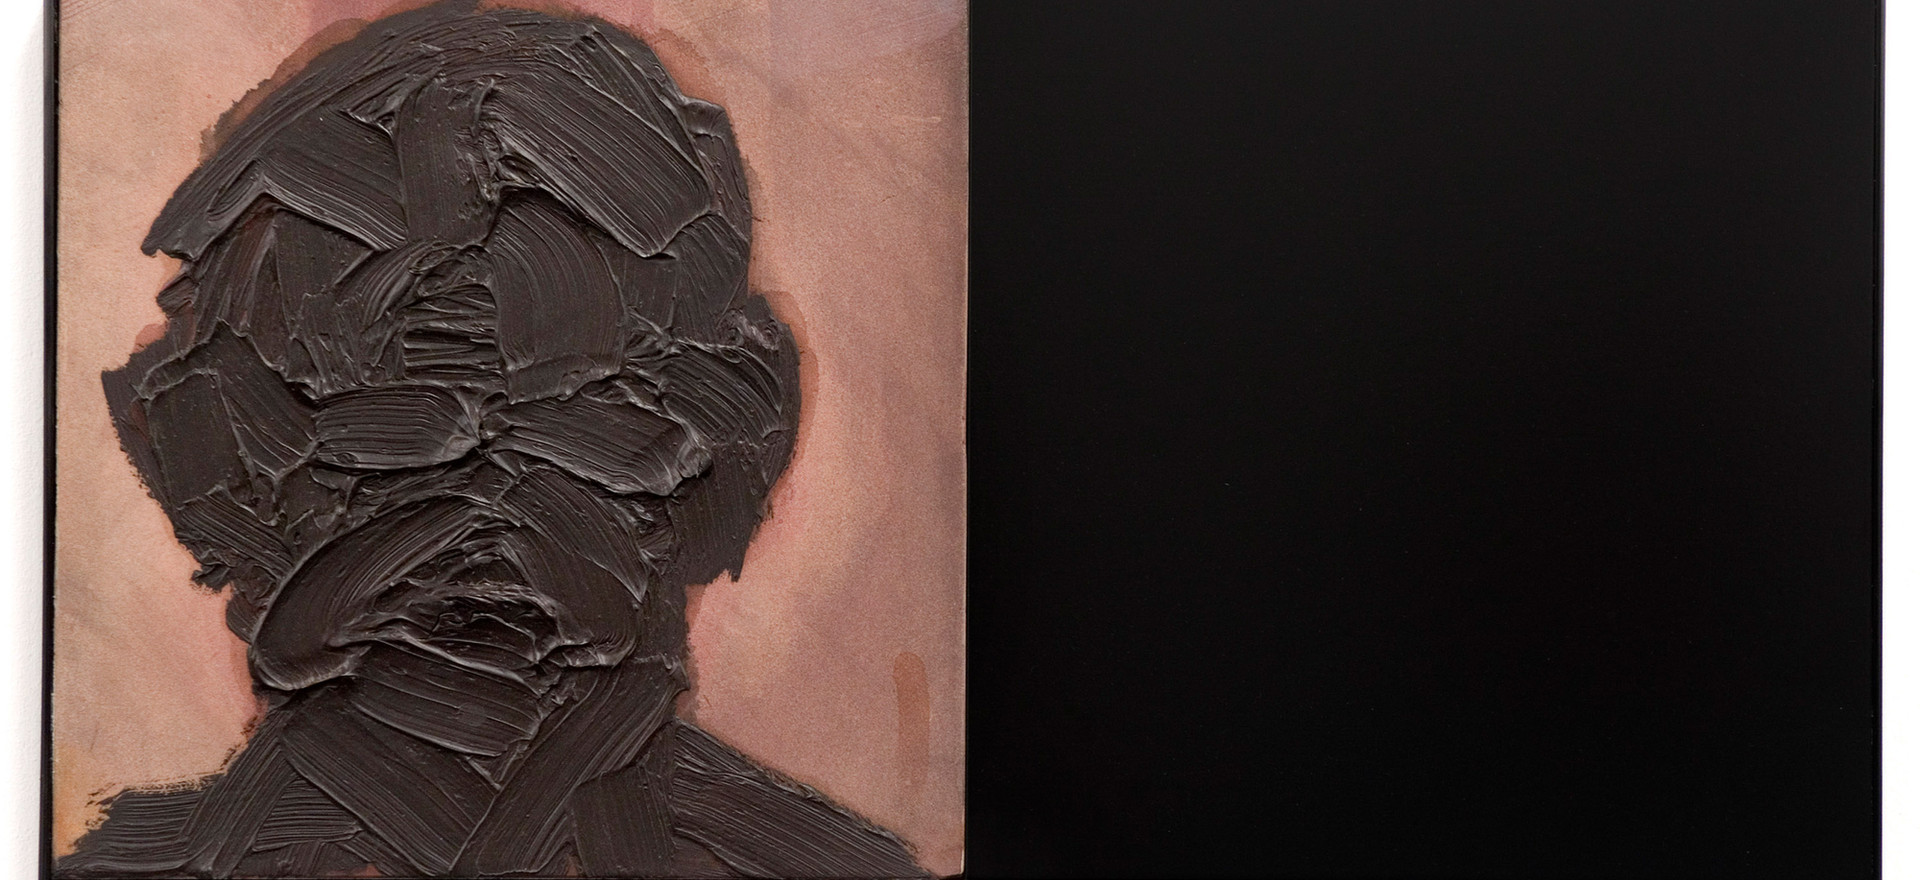 'Written', 2009, oil on sandstone, sprayed supawood, Perspex, 31 x 61 x 3.5cm